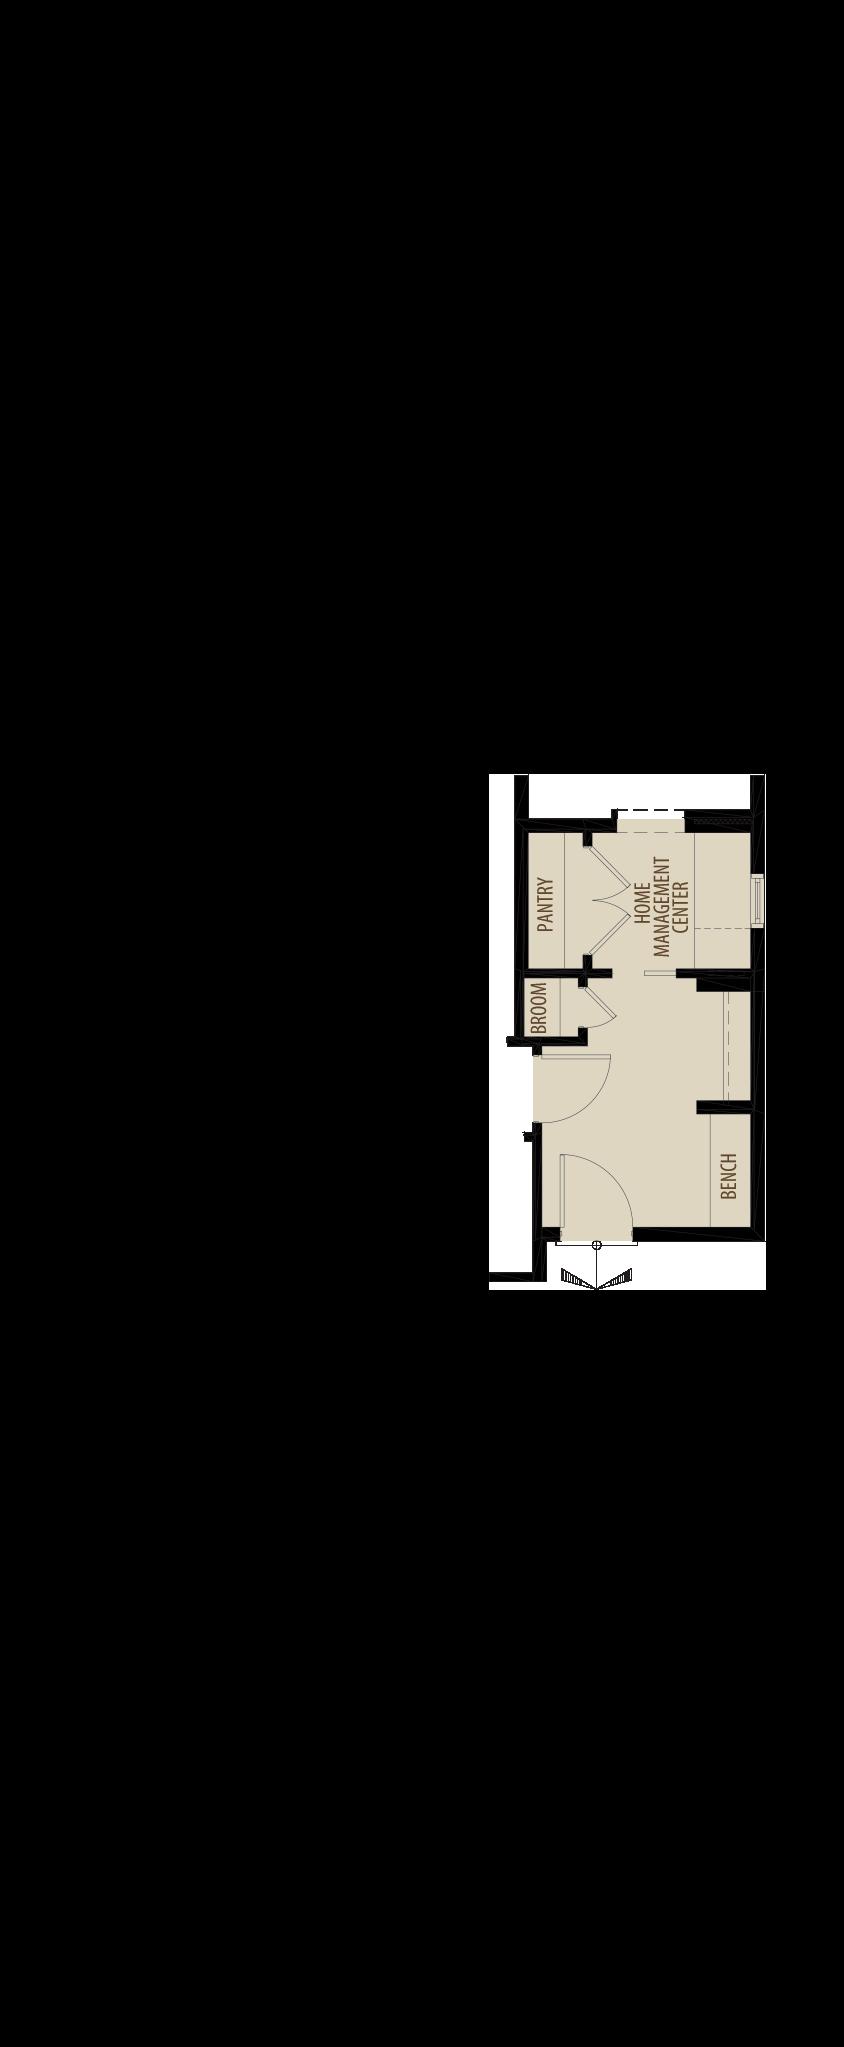 Home Management Centre